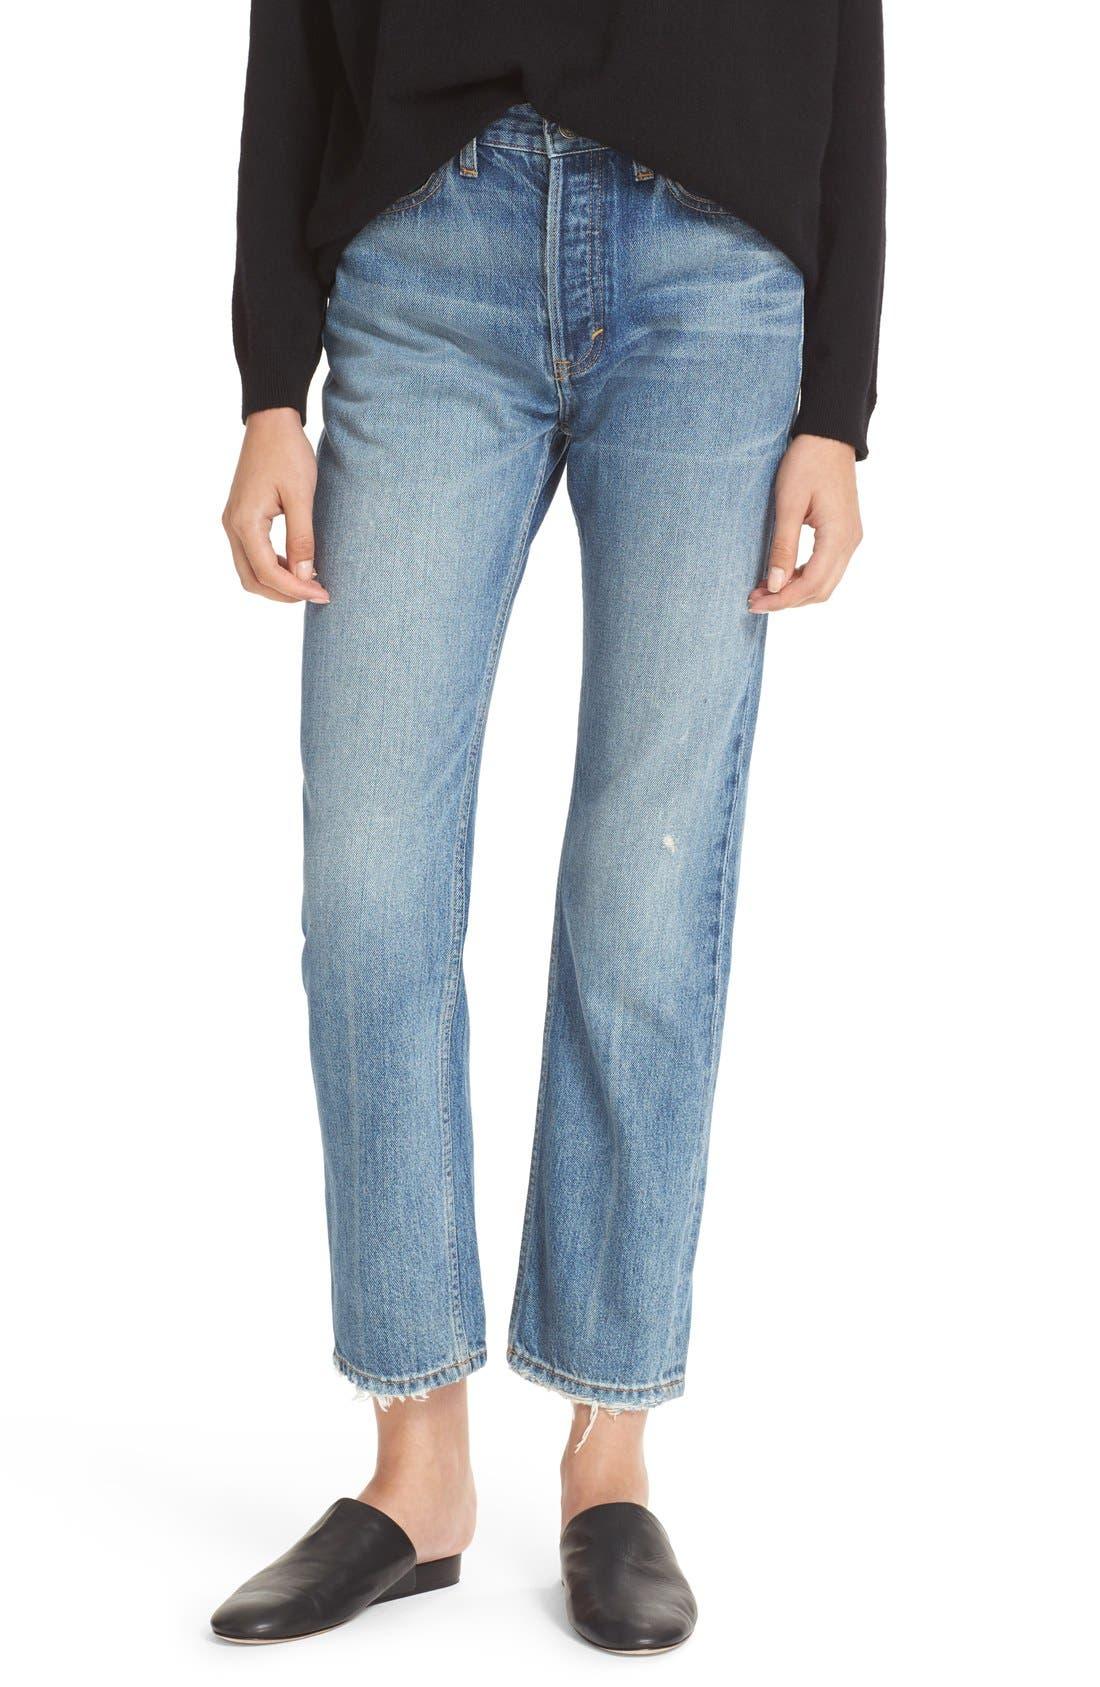 Alternate Image 1 Selected - Vince Vintage Straight Leg Crop Jeans (Calico)